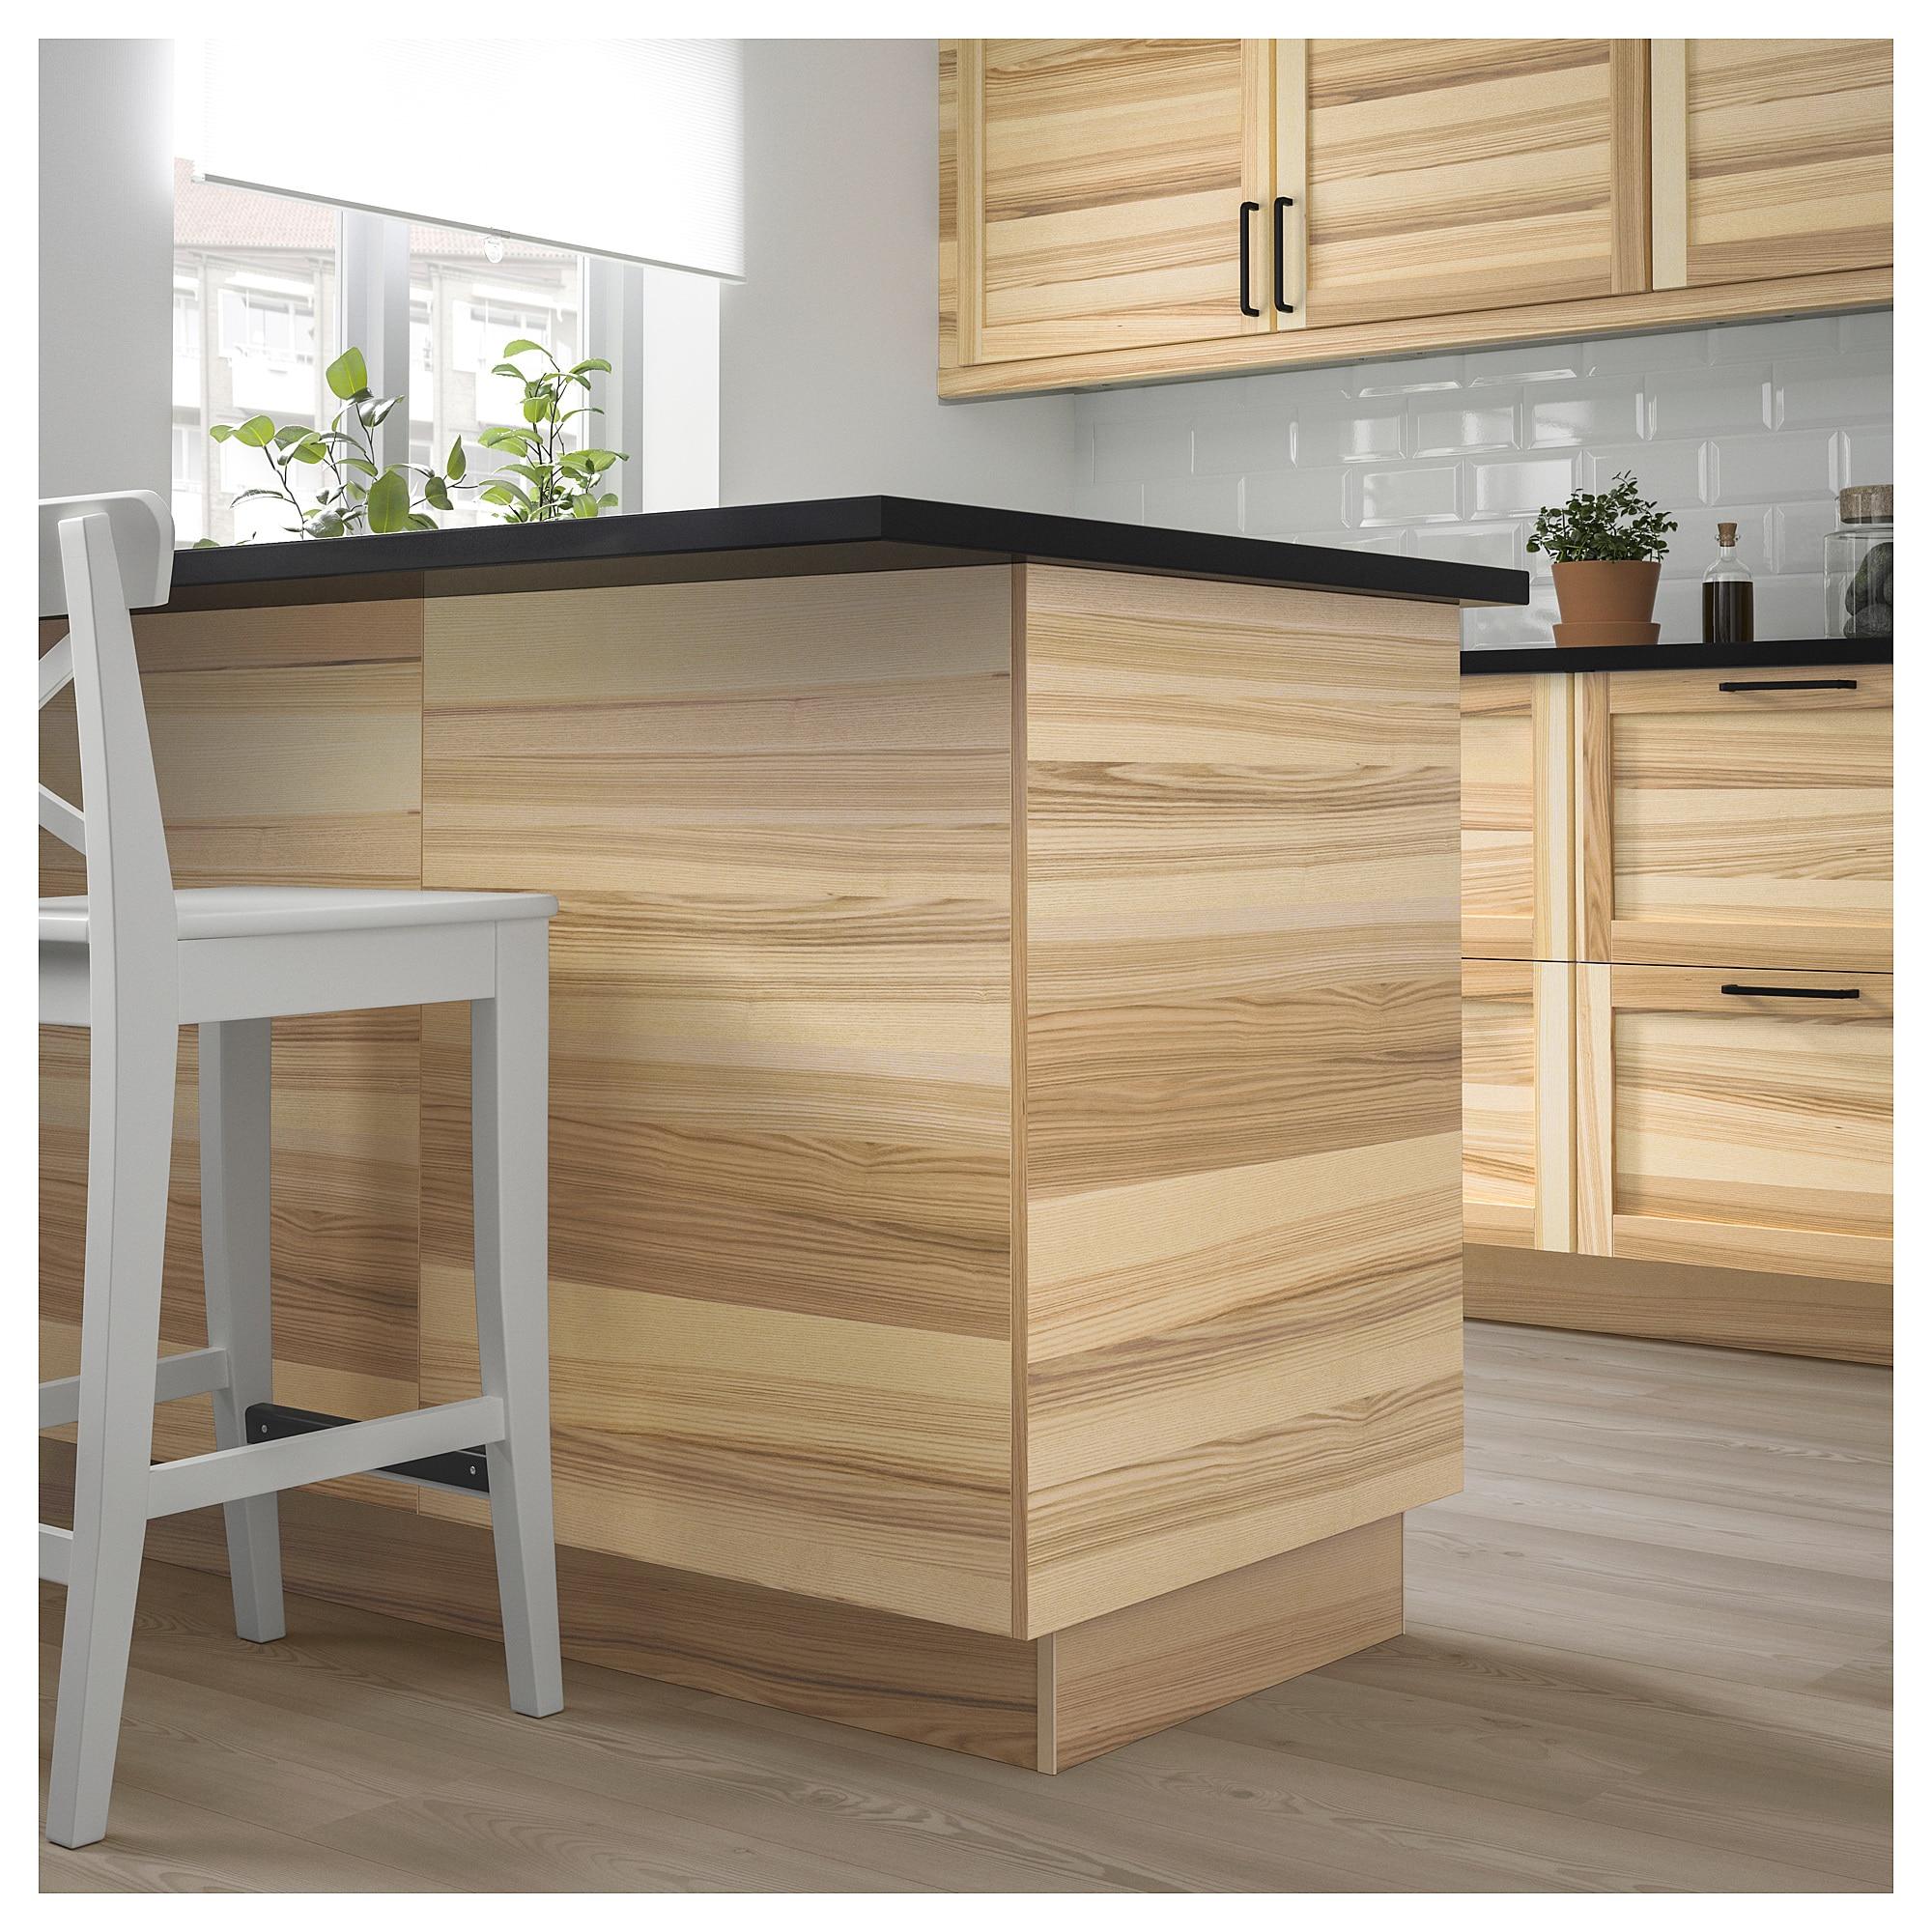 Torhamn Cover Panel Natural Ash Ikea Cottage Kitchen Design Cottage Kitchen Ikea